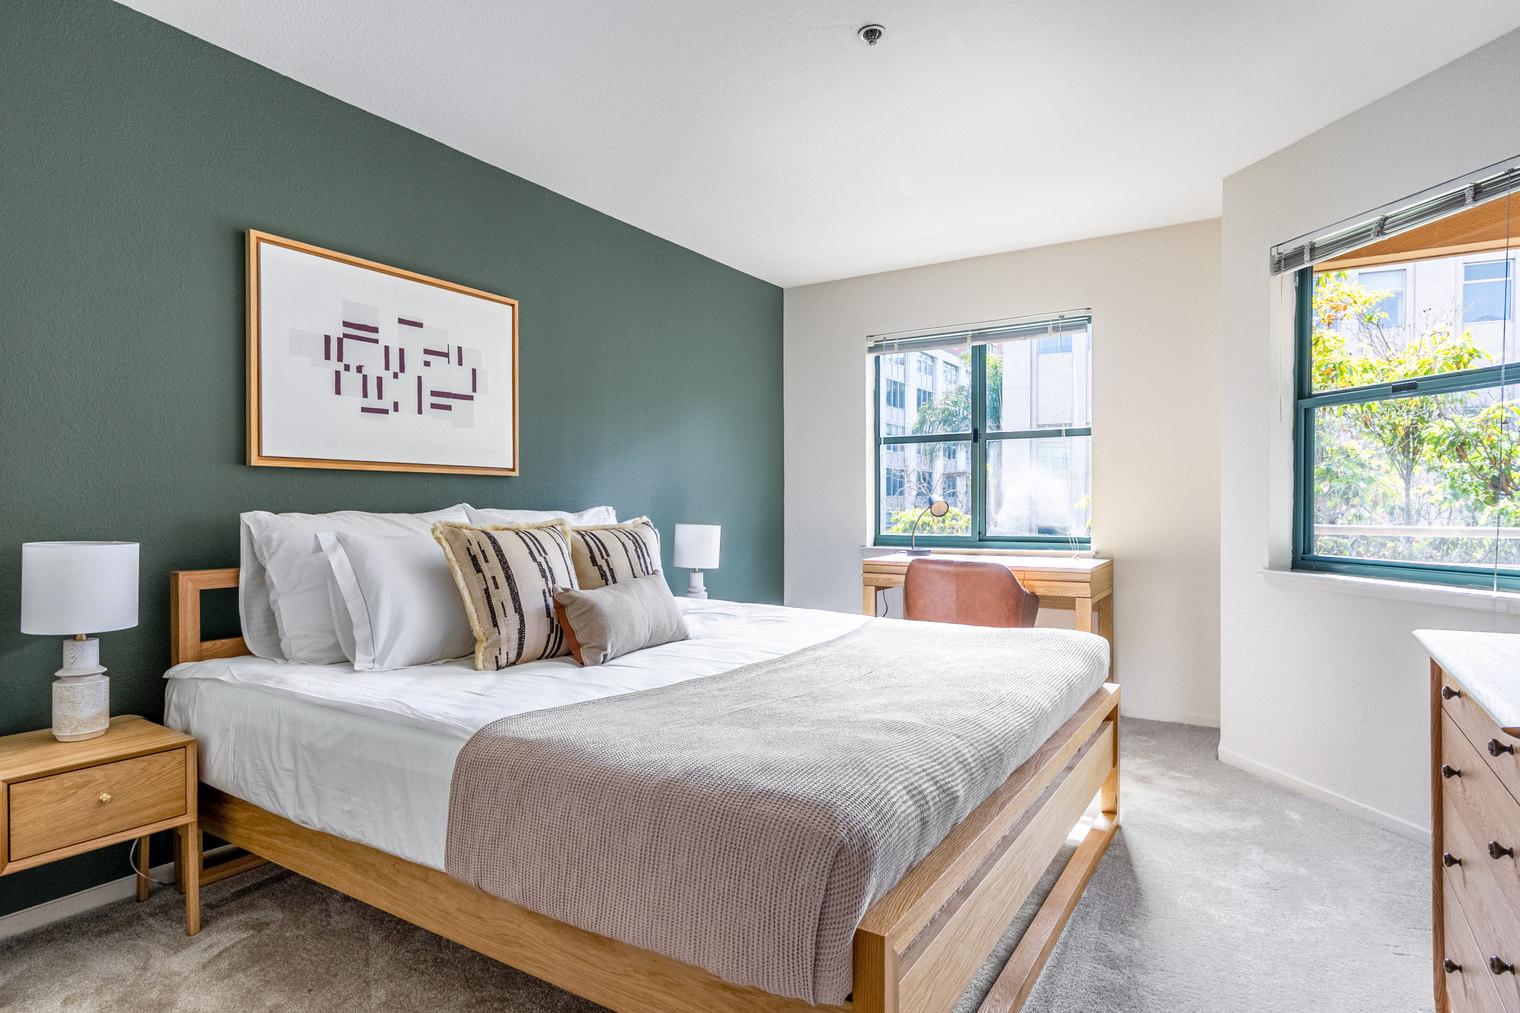 Bedroom at Bayside Village Place